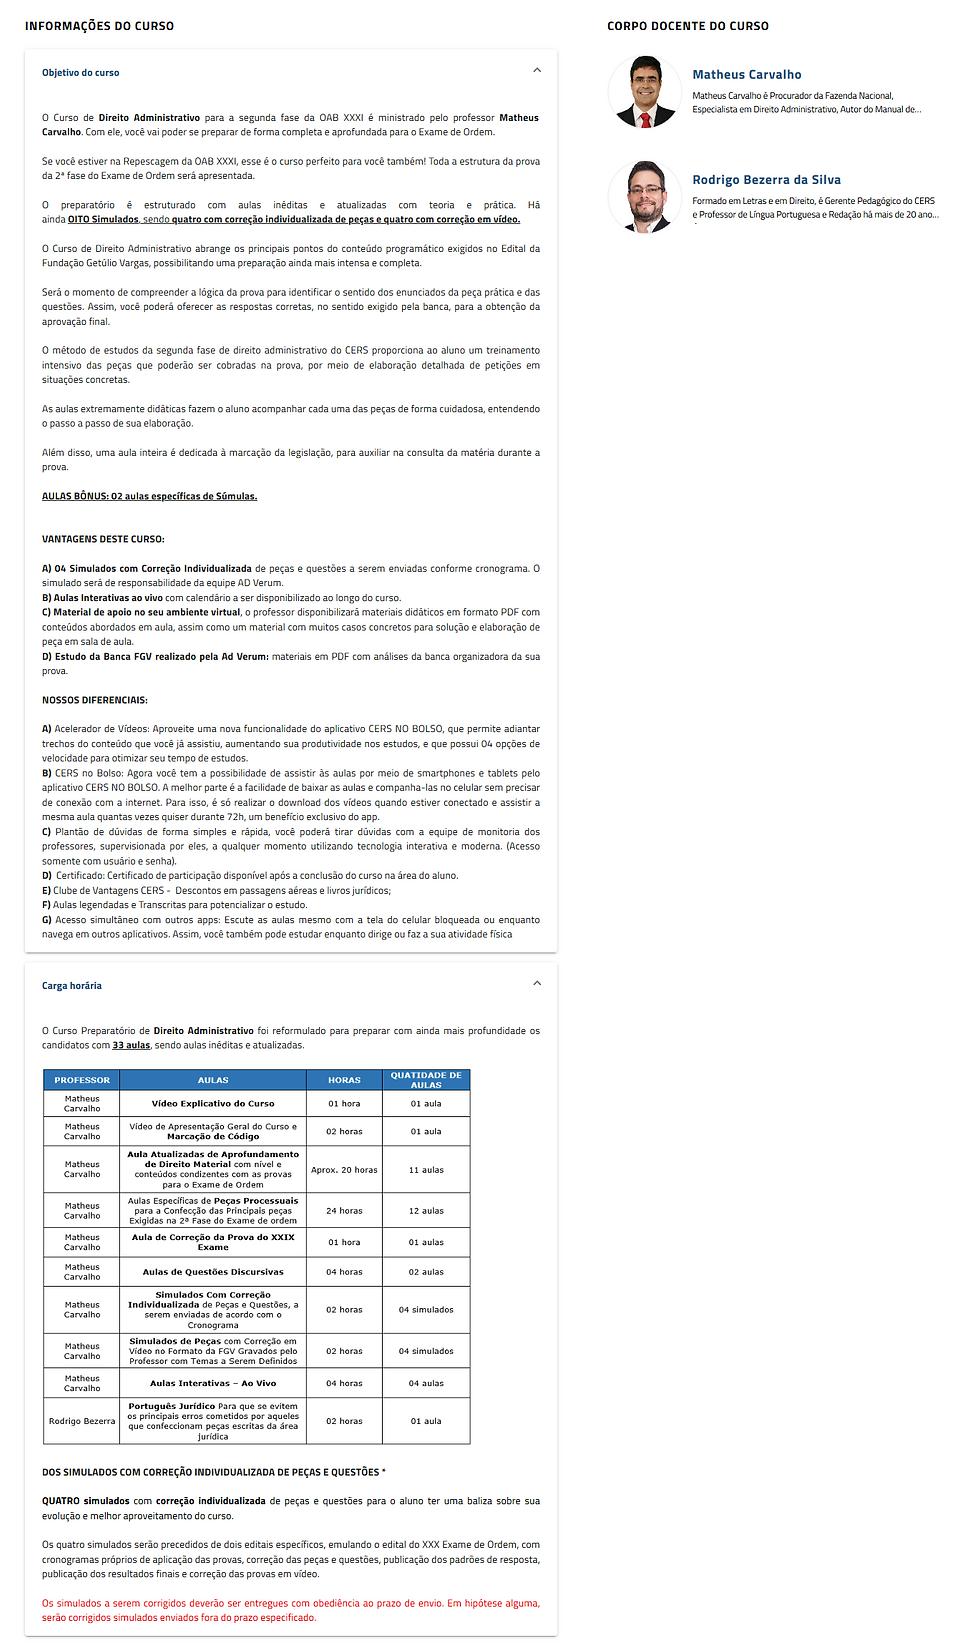 OAB_2ª_Fase_Direito_Administrativo_CS.pn